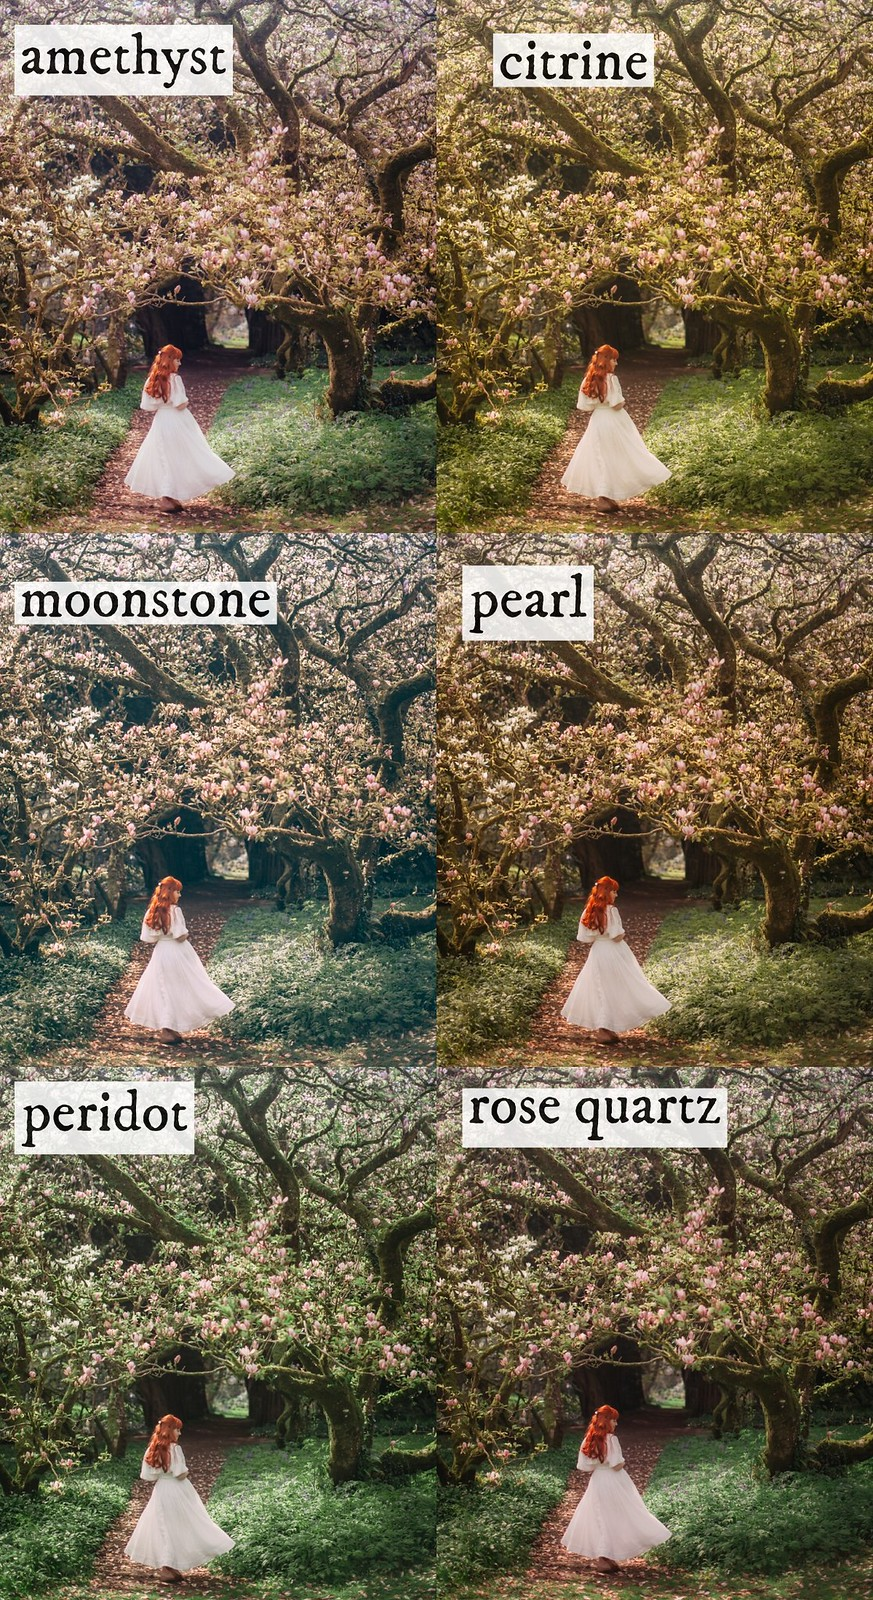 cottagecore aethestic, cottagecore preset, cottagecore filter, cottagecore editing, pastel presets, aclotheshorse editing